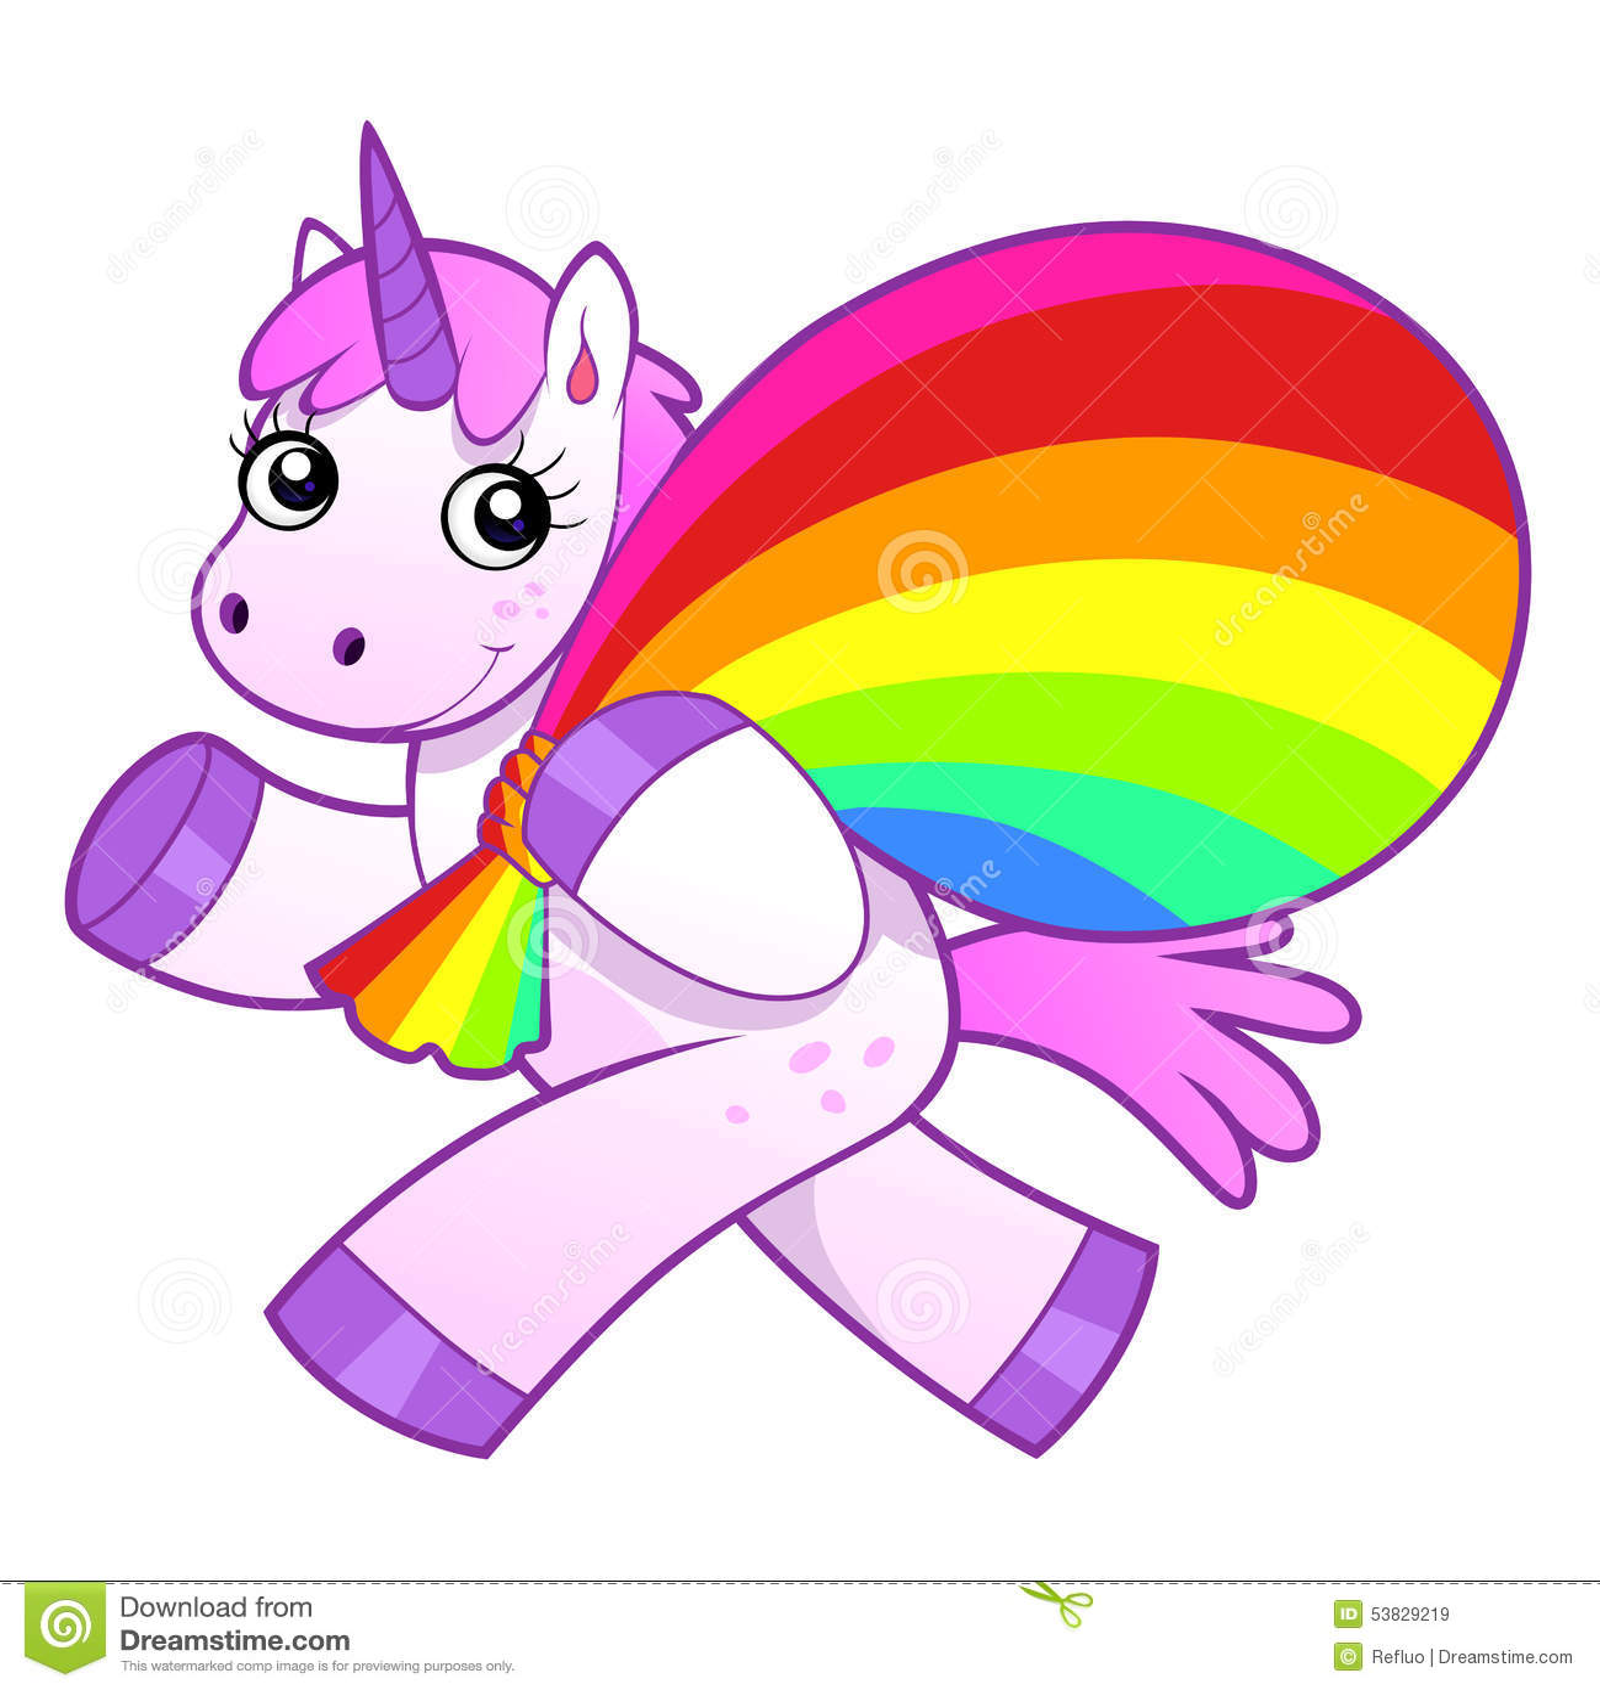 unicorn with rainbow bag stock vector image 53829219 clip art ballerina slippers clip art ballerina shoes